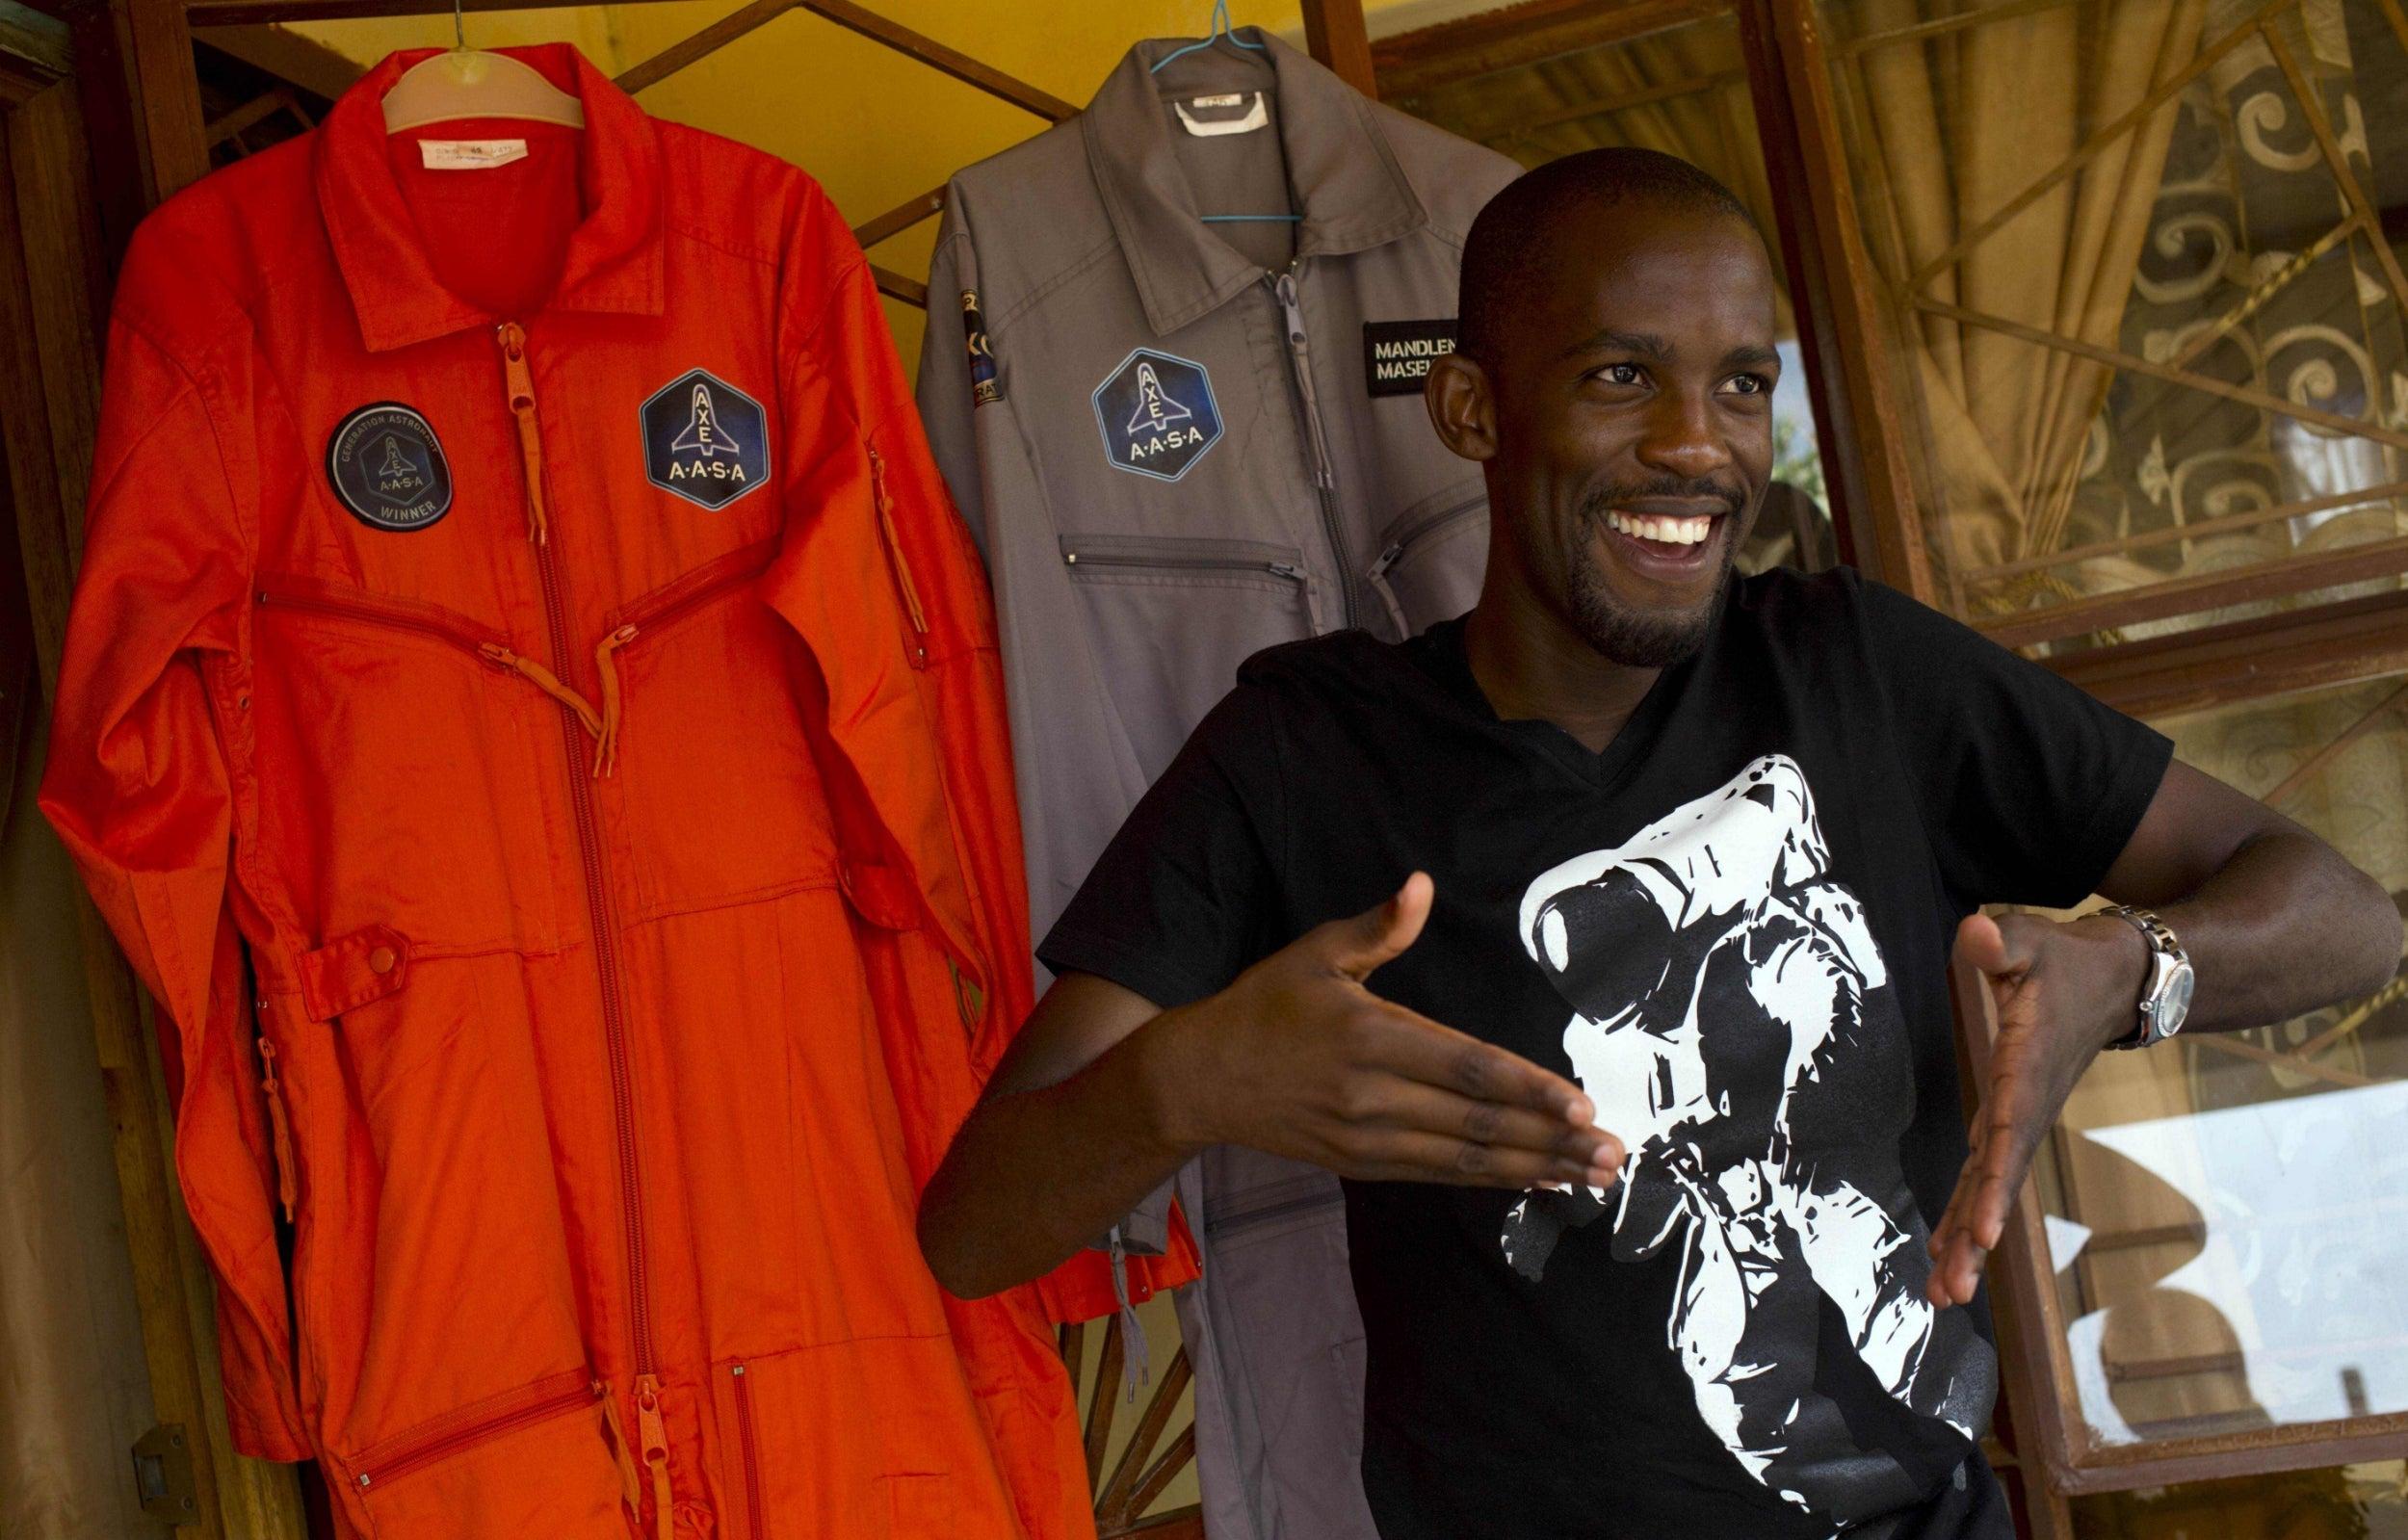 Mandla Maseko ilk siyahi Afrikalı astronot